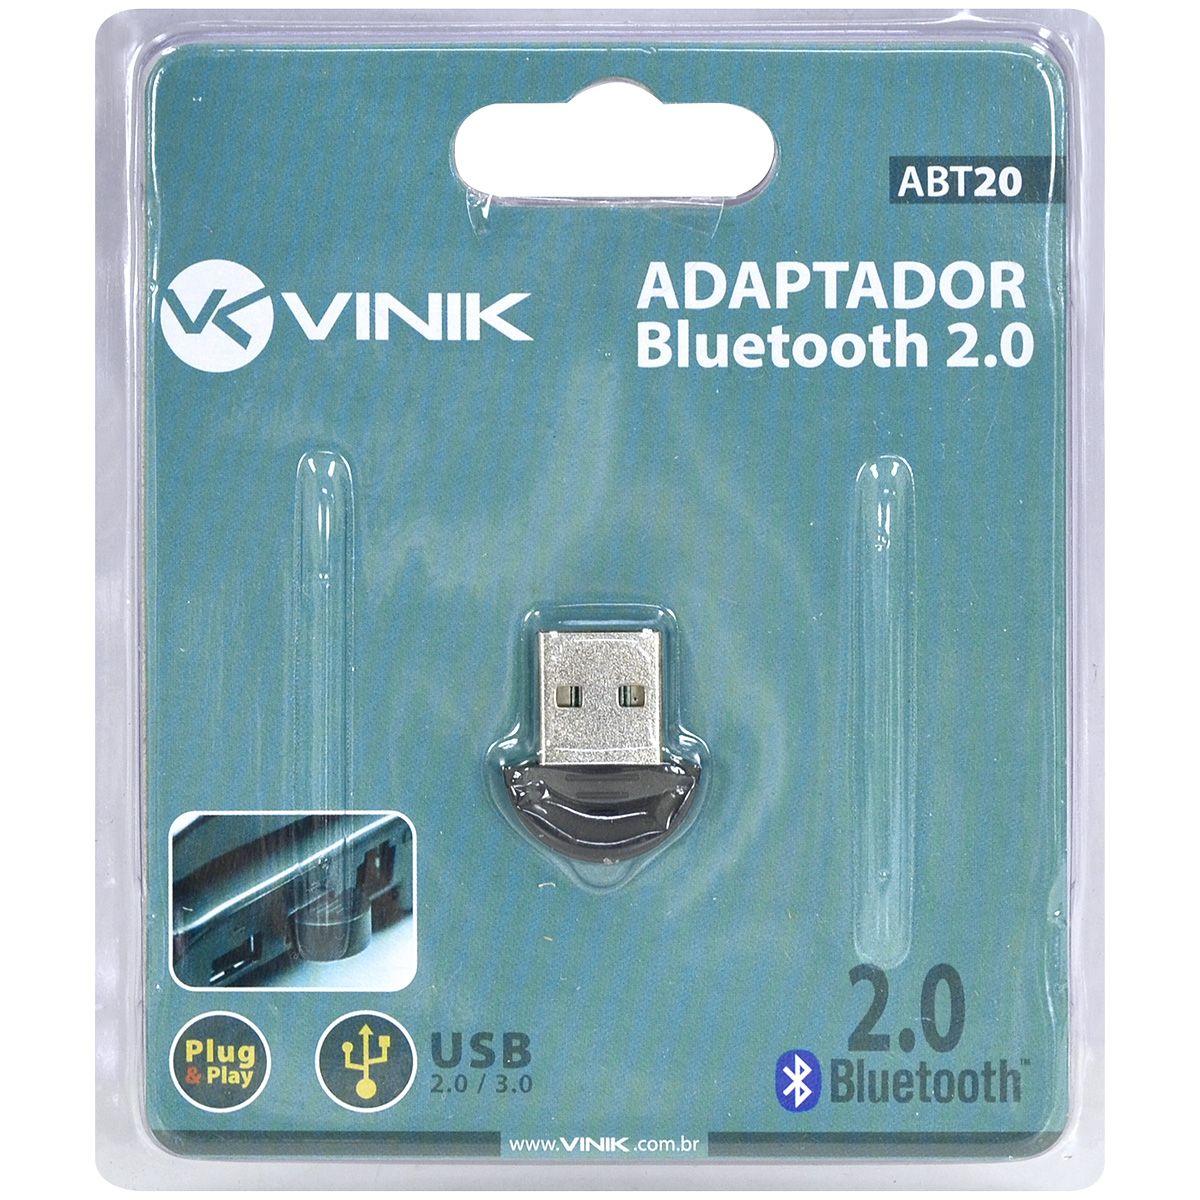 Adaptador Bluetooth 2.0 ABT20 Preto 26314 - Vinik